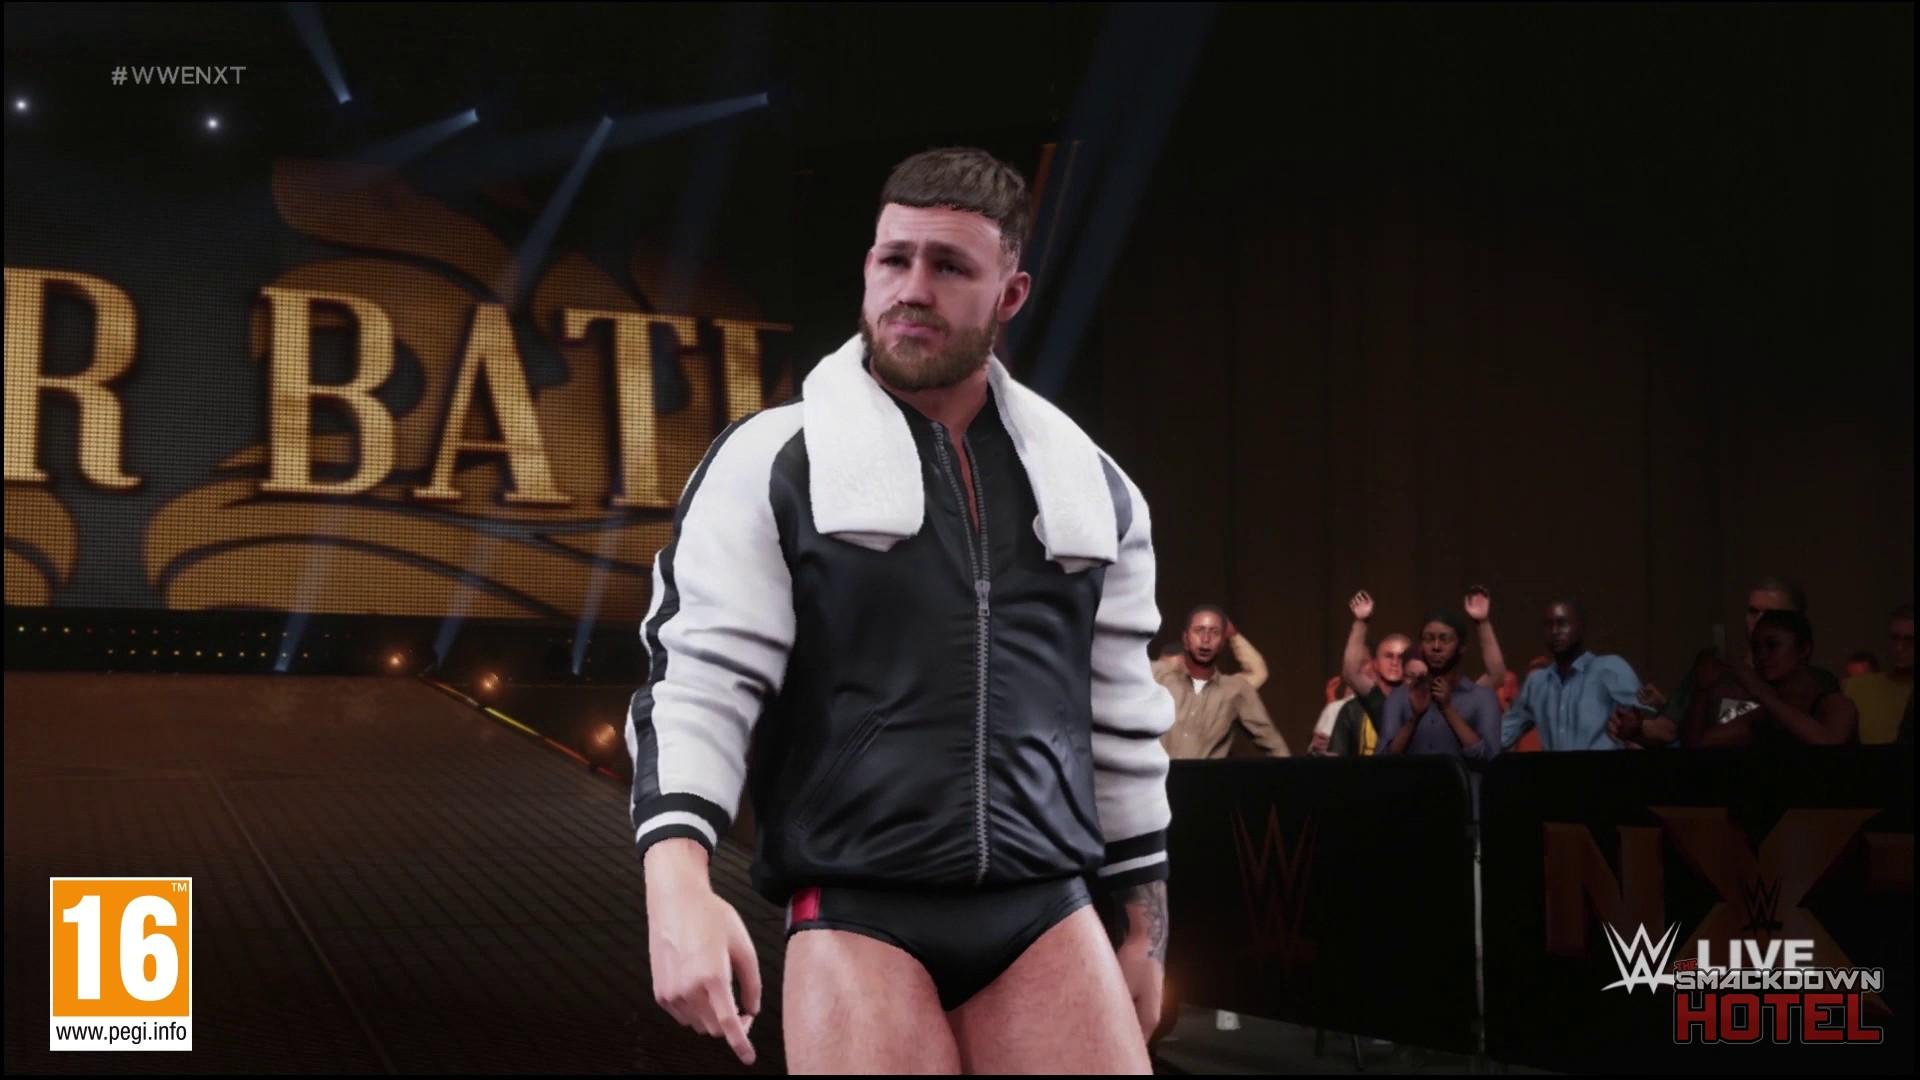 WWE 2K19 : Pete Dunne & Tyler Bate - Entrées + screenshots  WWE_2K19_TylerBate_2-15329-1080